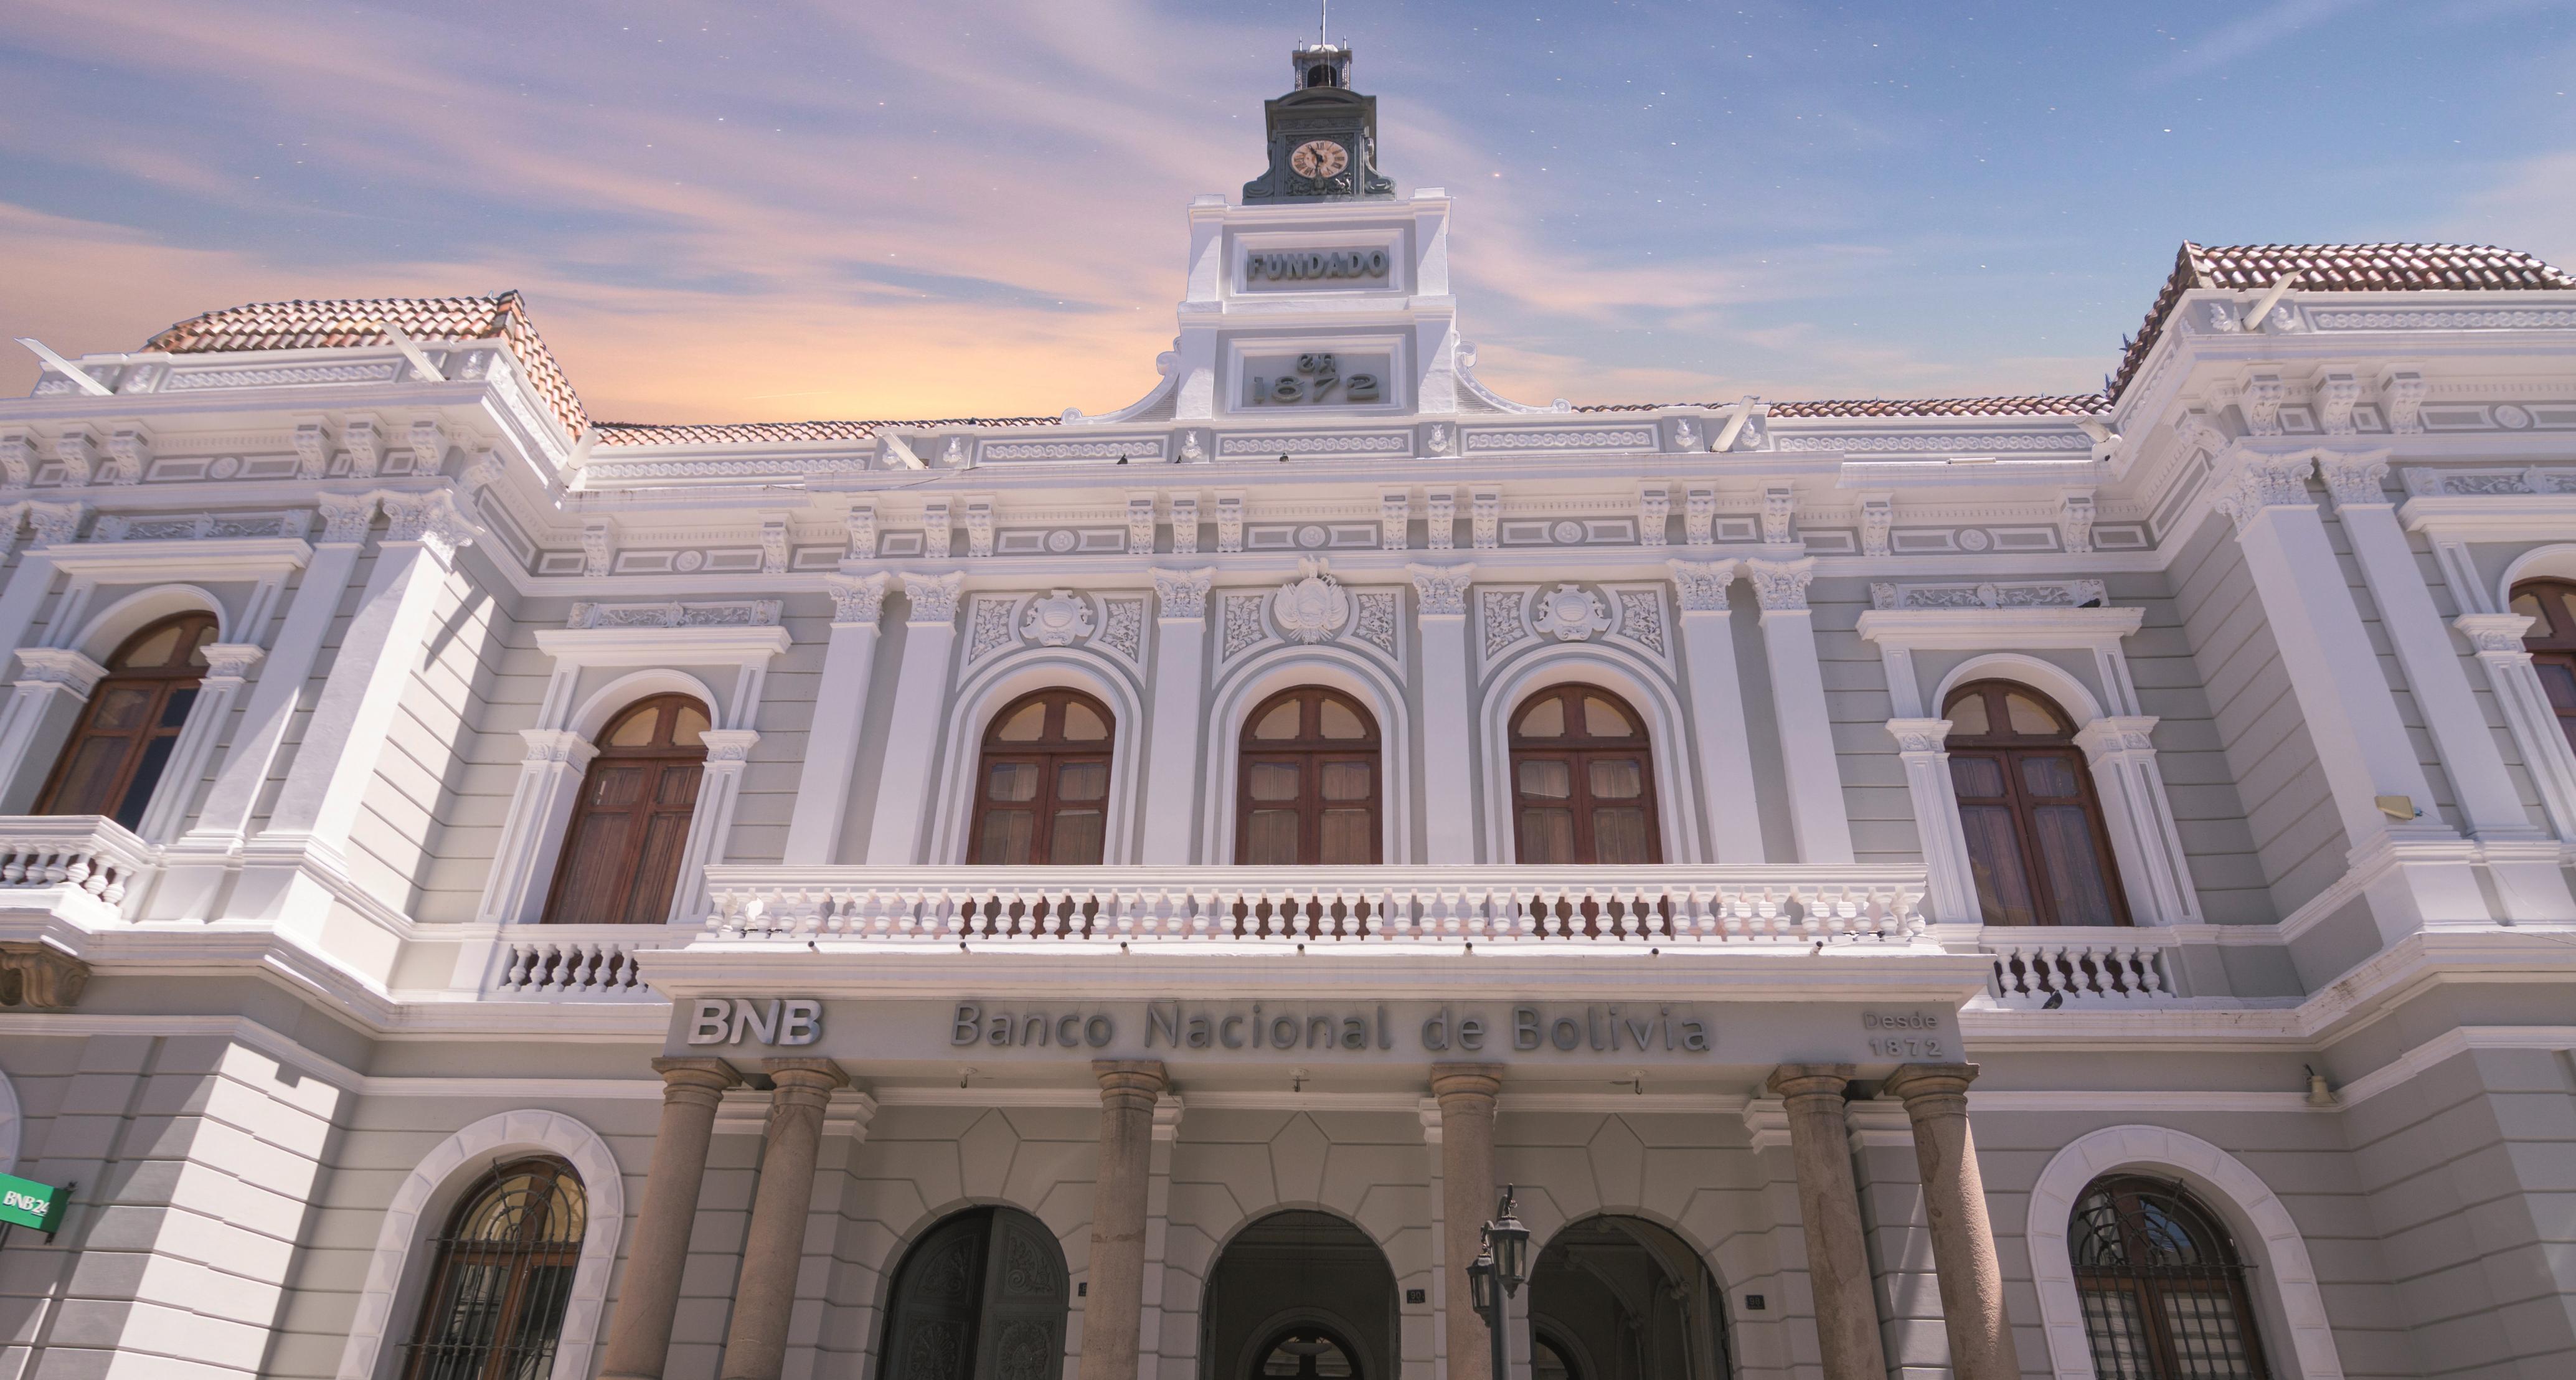 Banco Nacional de Bolivia (BNB) cumple 147 años